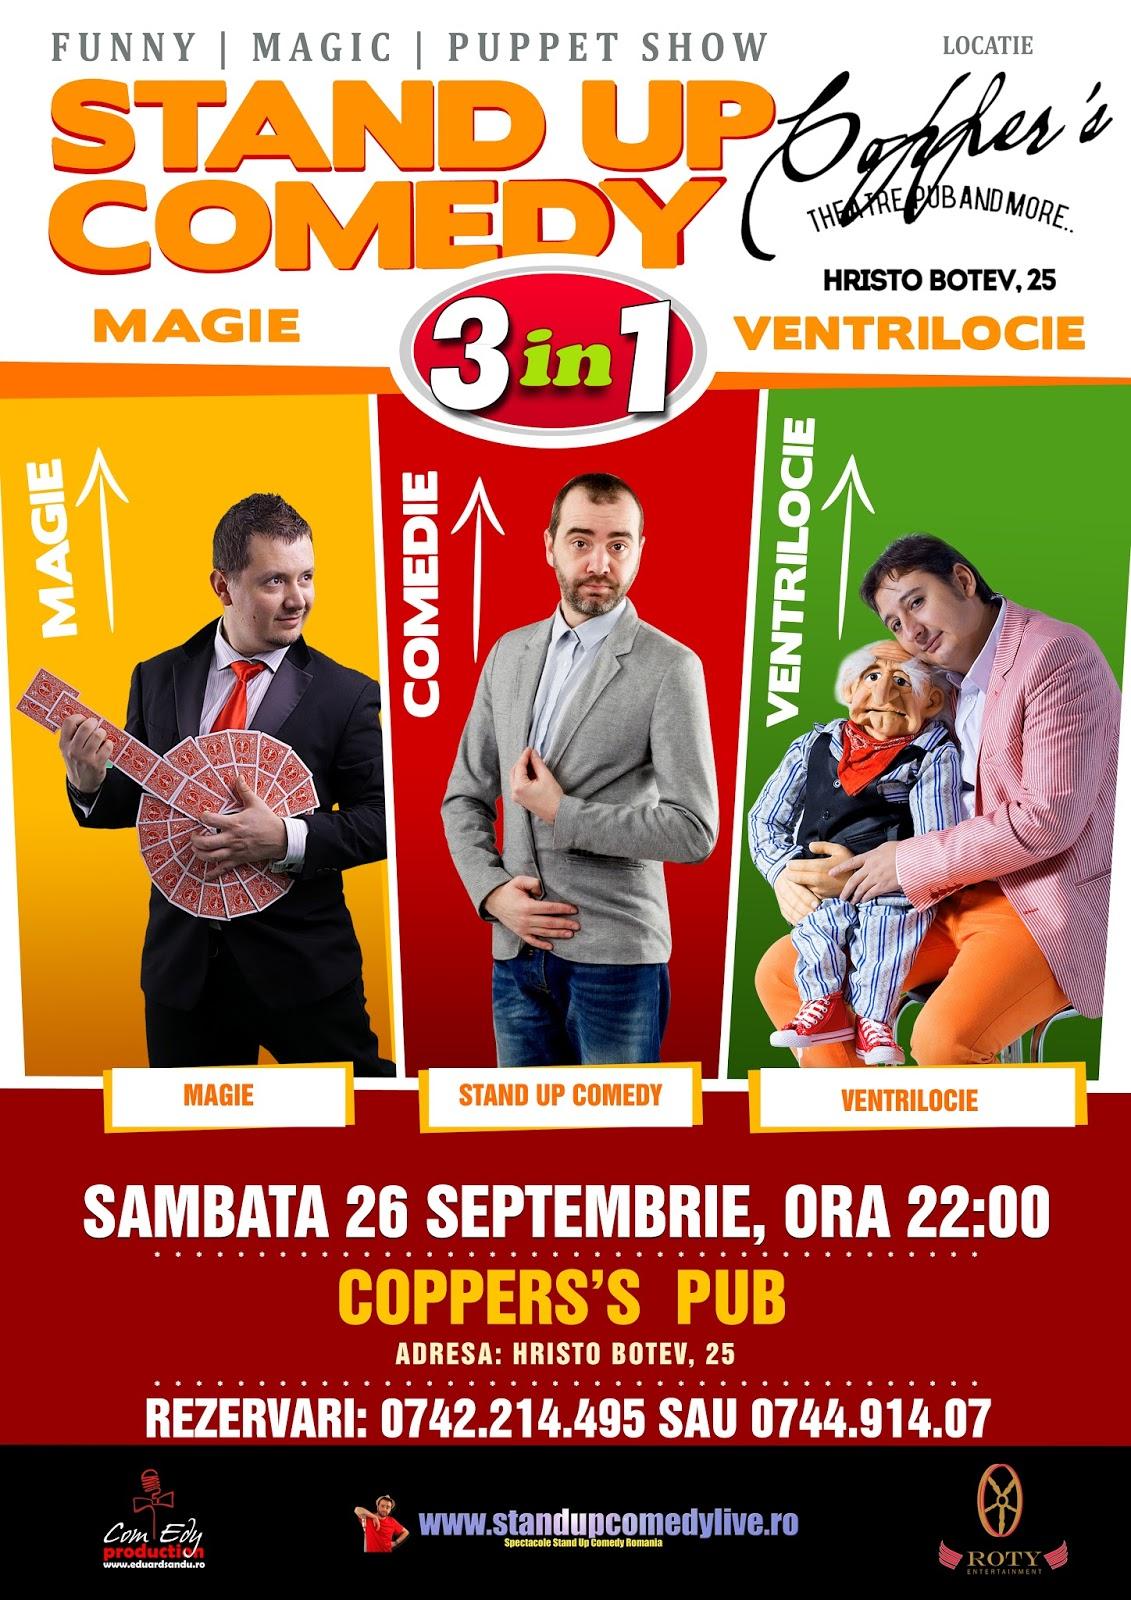 Stand-up Comedy, Magie si Ventrilocie-Sambata 26 Septembrie Bucuresti